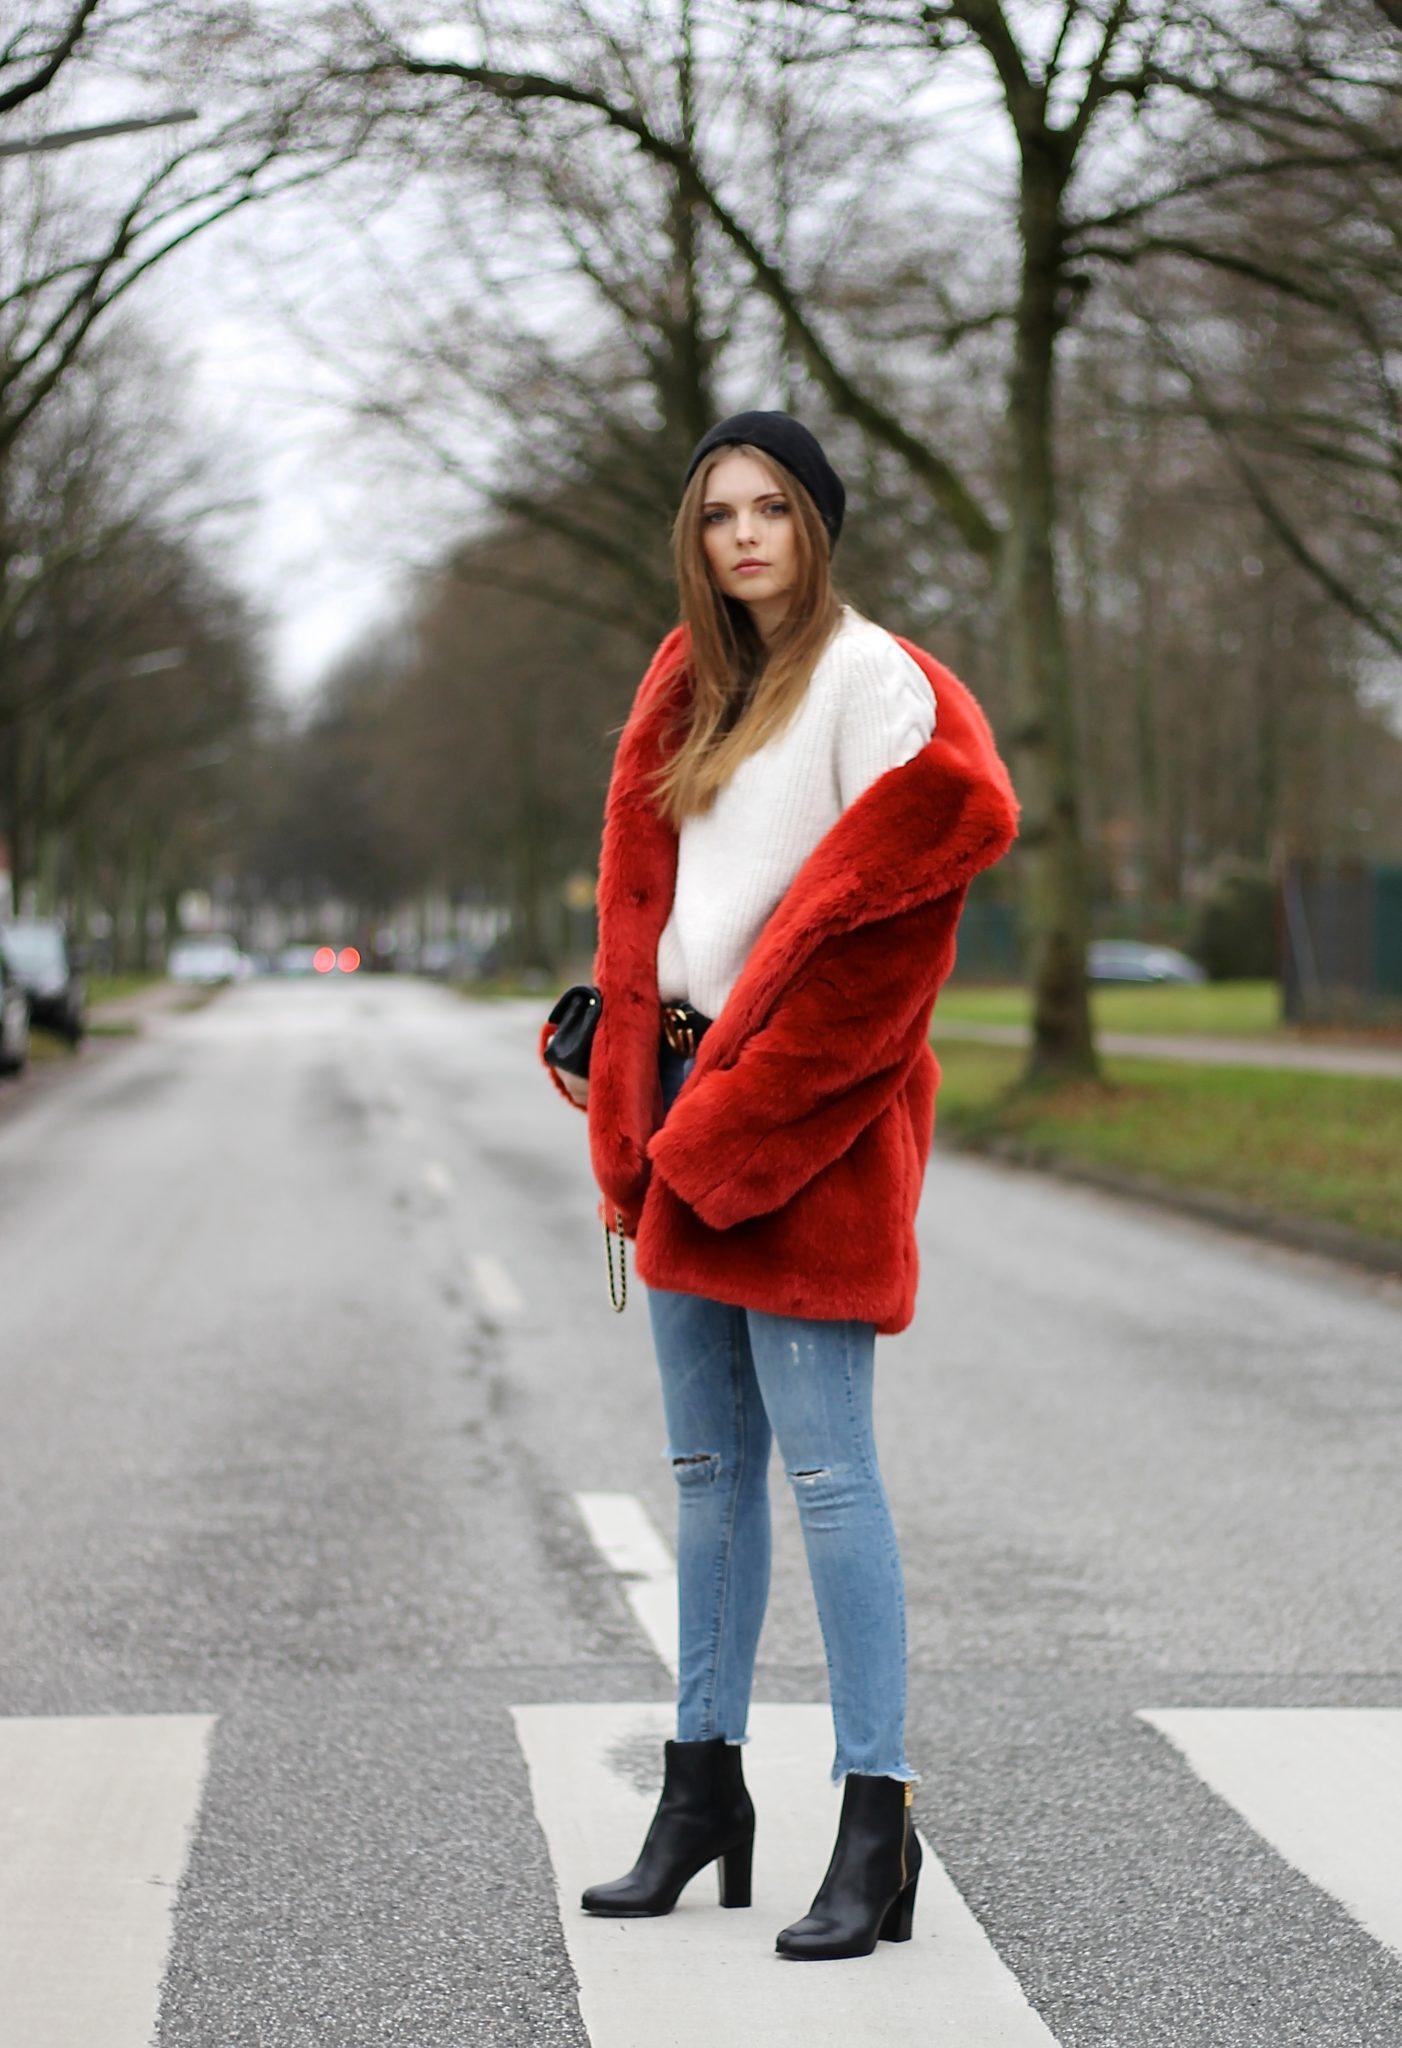 IMG 7655 - AUTUMN COLOR RED I H&M FAUX FUR COAT